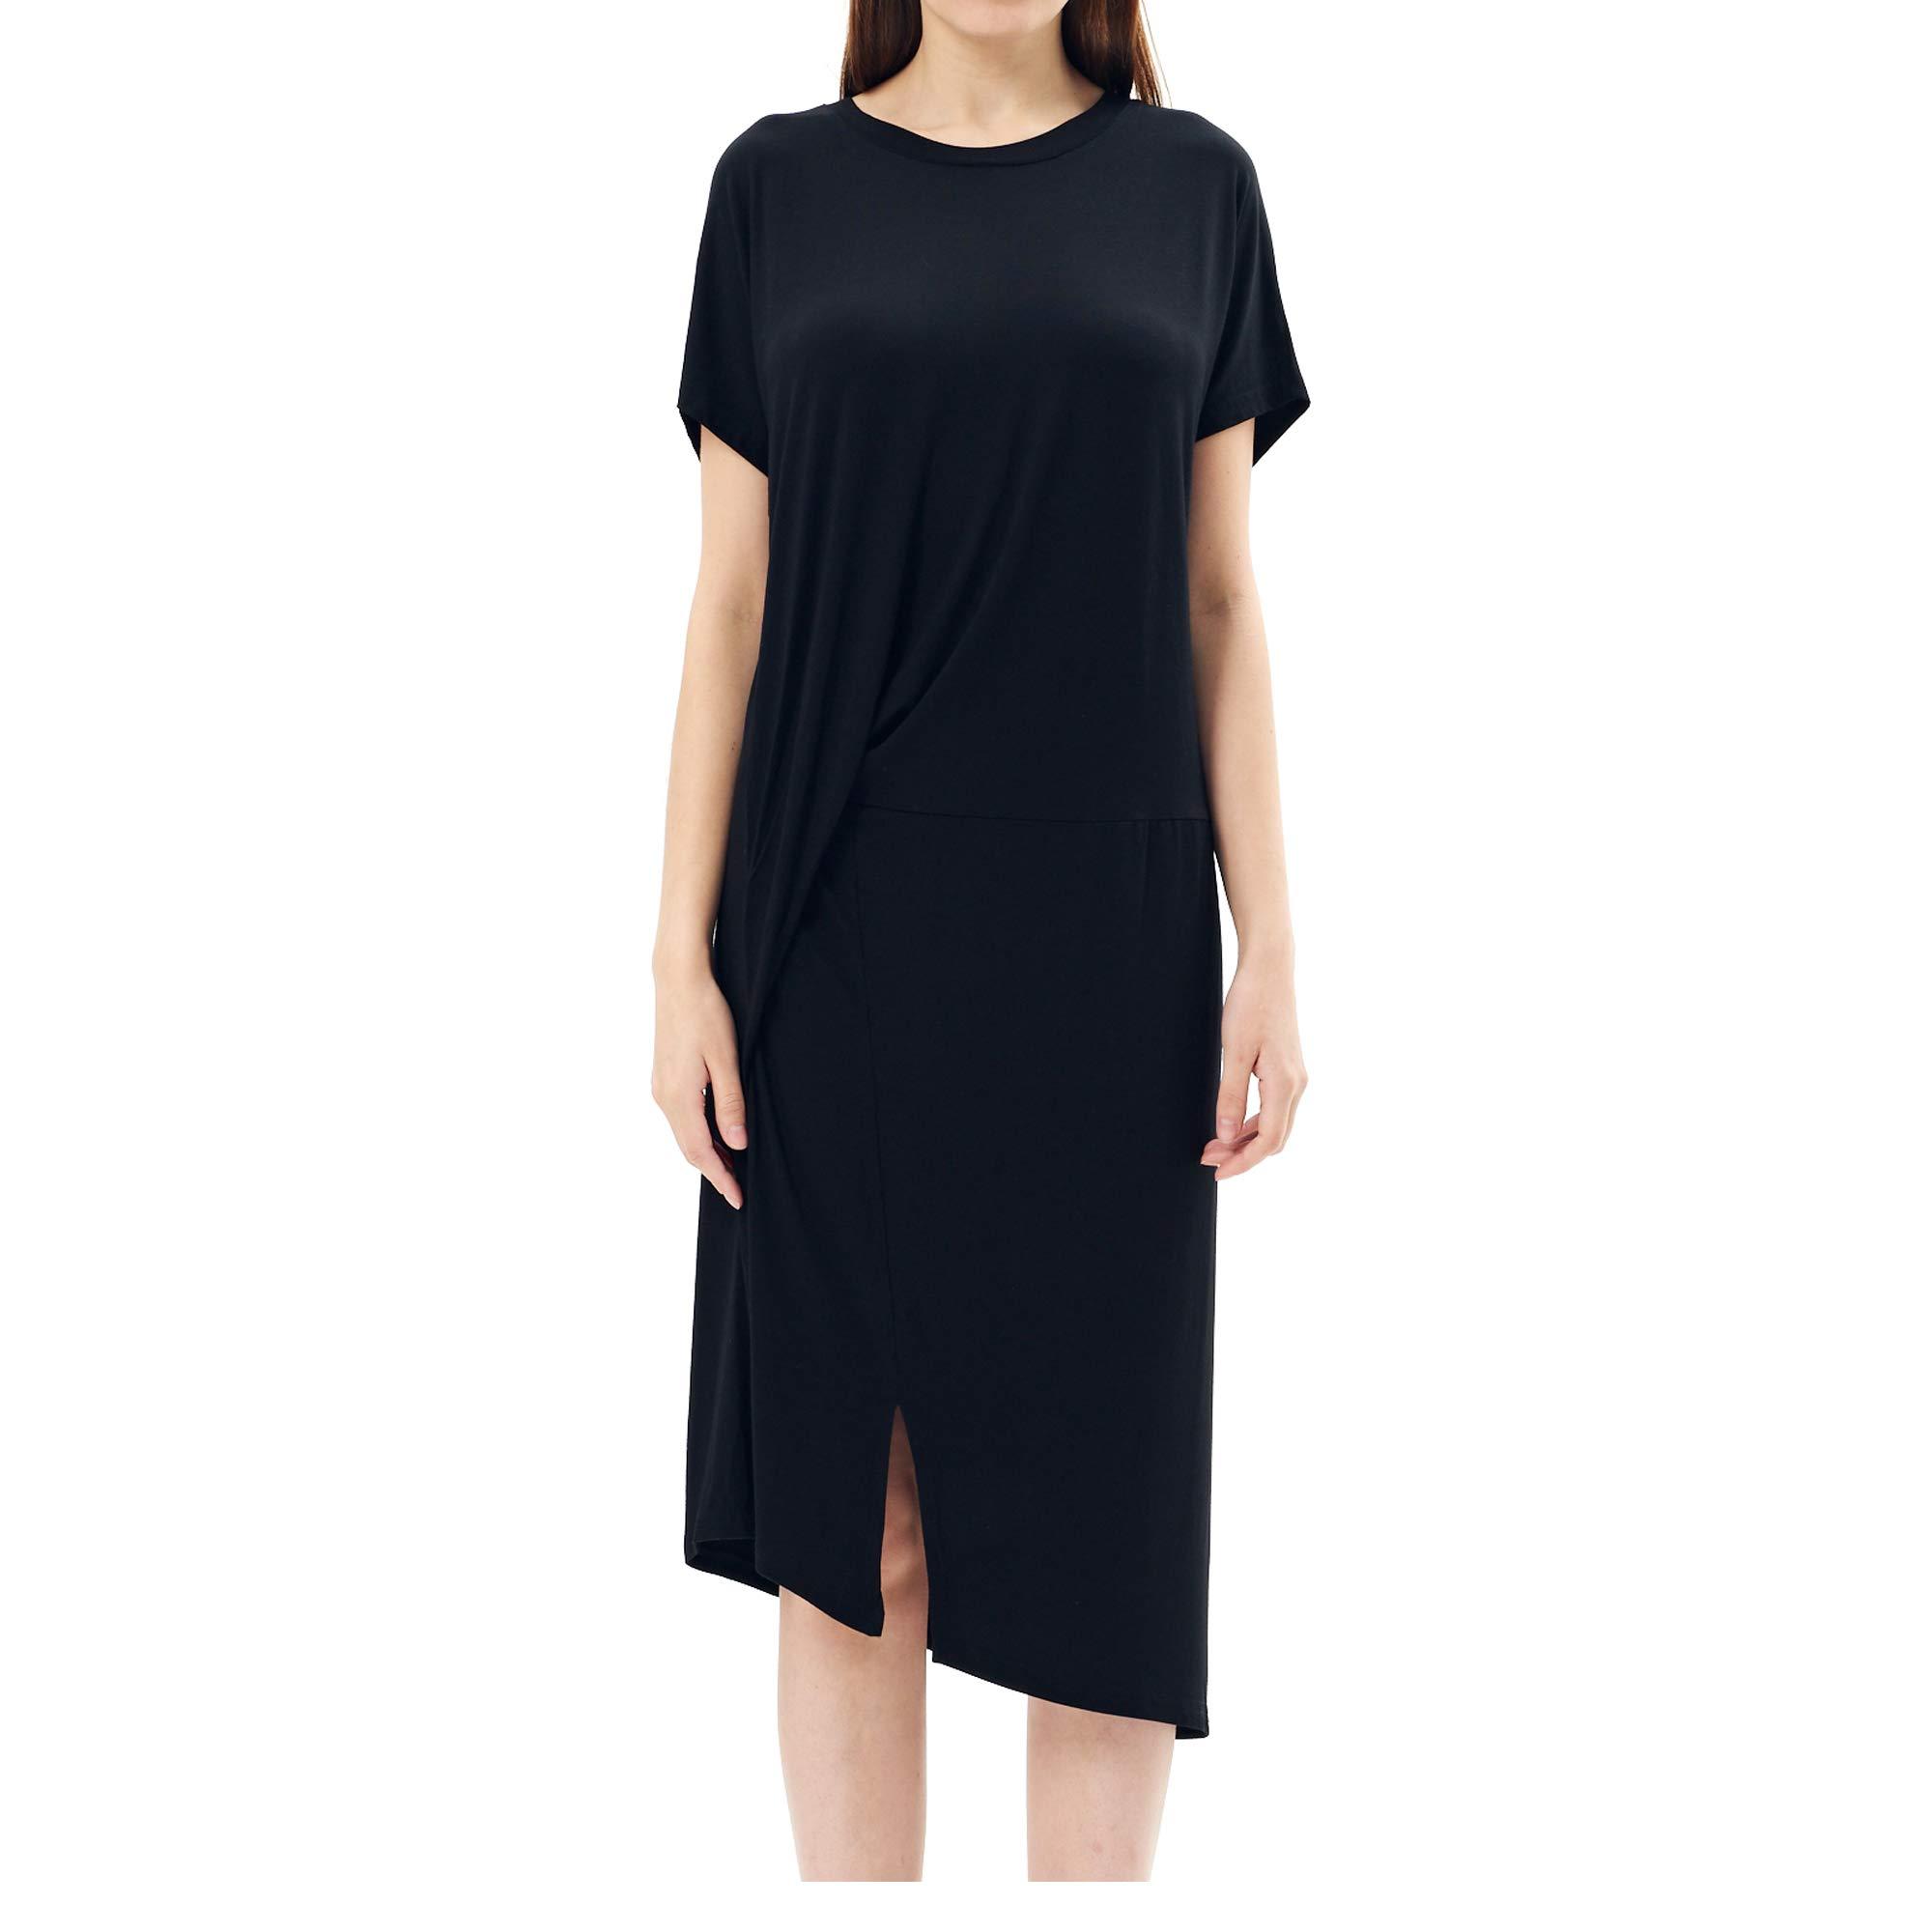 Charis Allure Women's Short Sleeve Short Sleeve Dress Loose T Shirt Long Dress with Split,Black